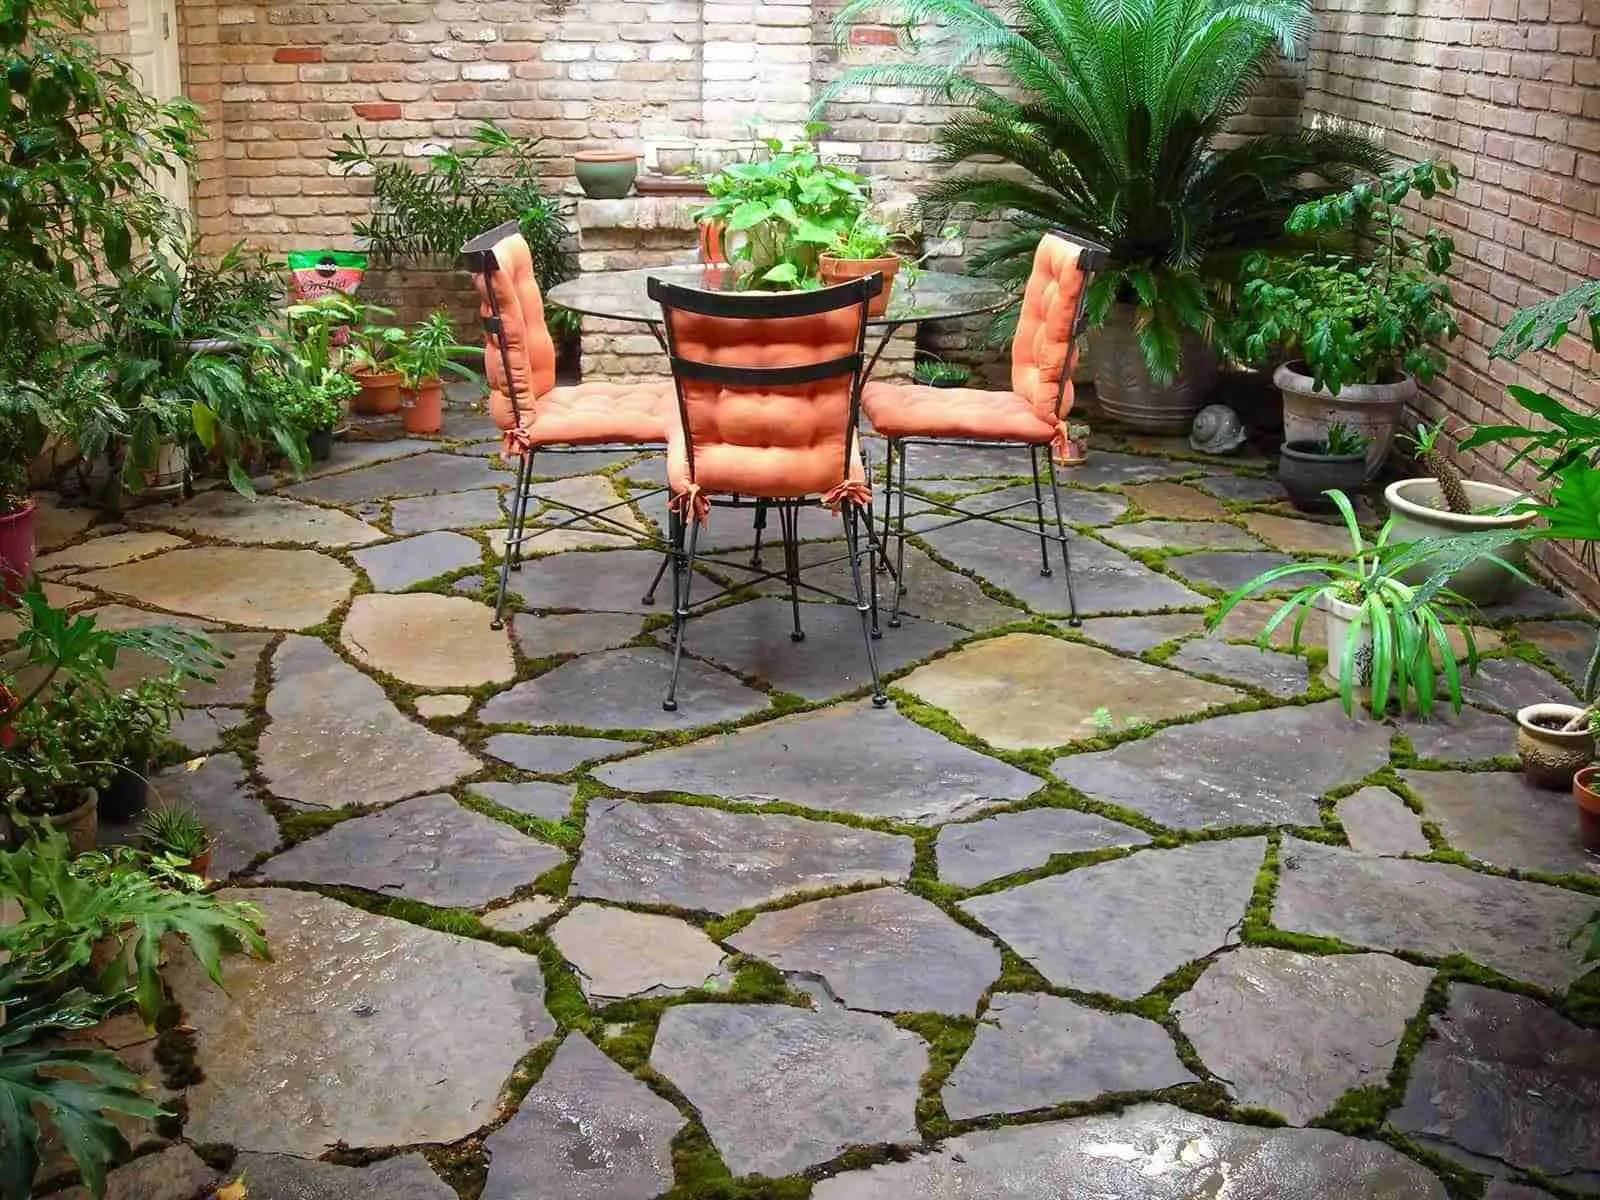 5 Ways to Beautify Your Backyard | Aden Earthworks on Rocks In Backyard  id=93795